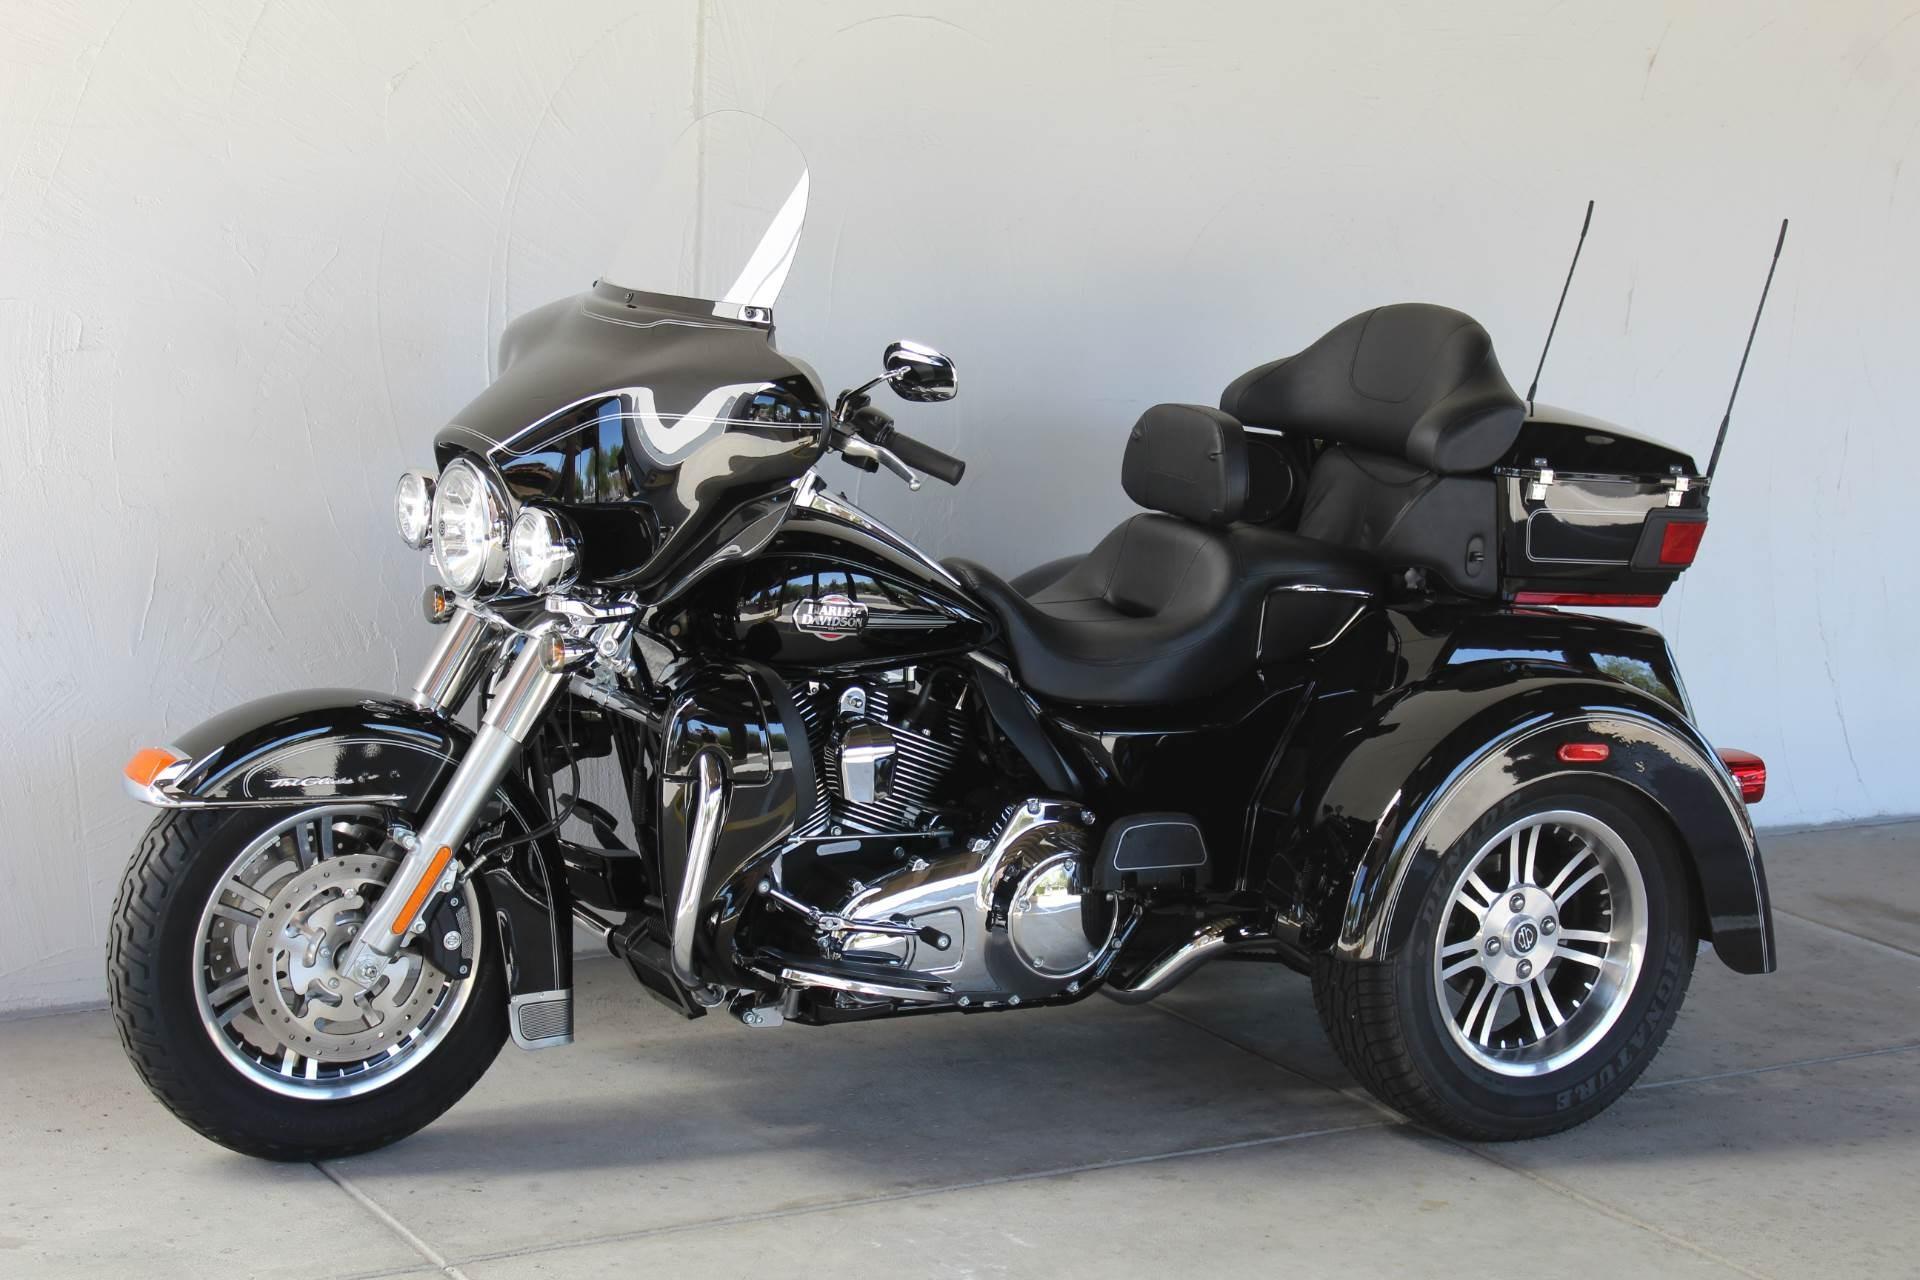 2013 Harley Davidson Flhtcutg Tri Glide Ultra Classic Review: 2013 Harley-Davidson® FLHTCUTG Tri Glide™ Ultra Classic